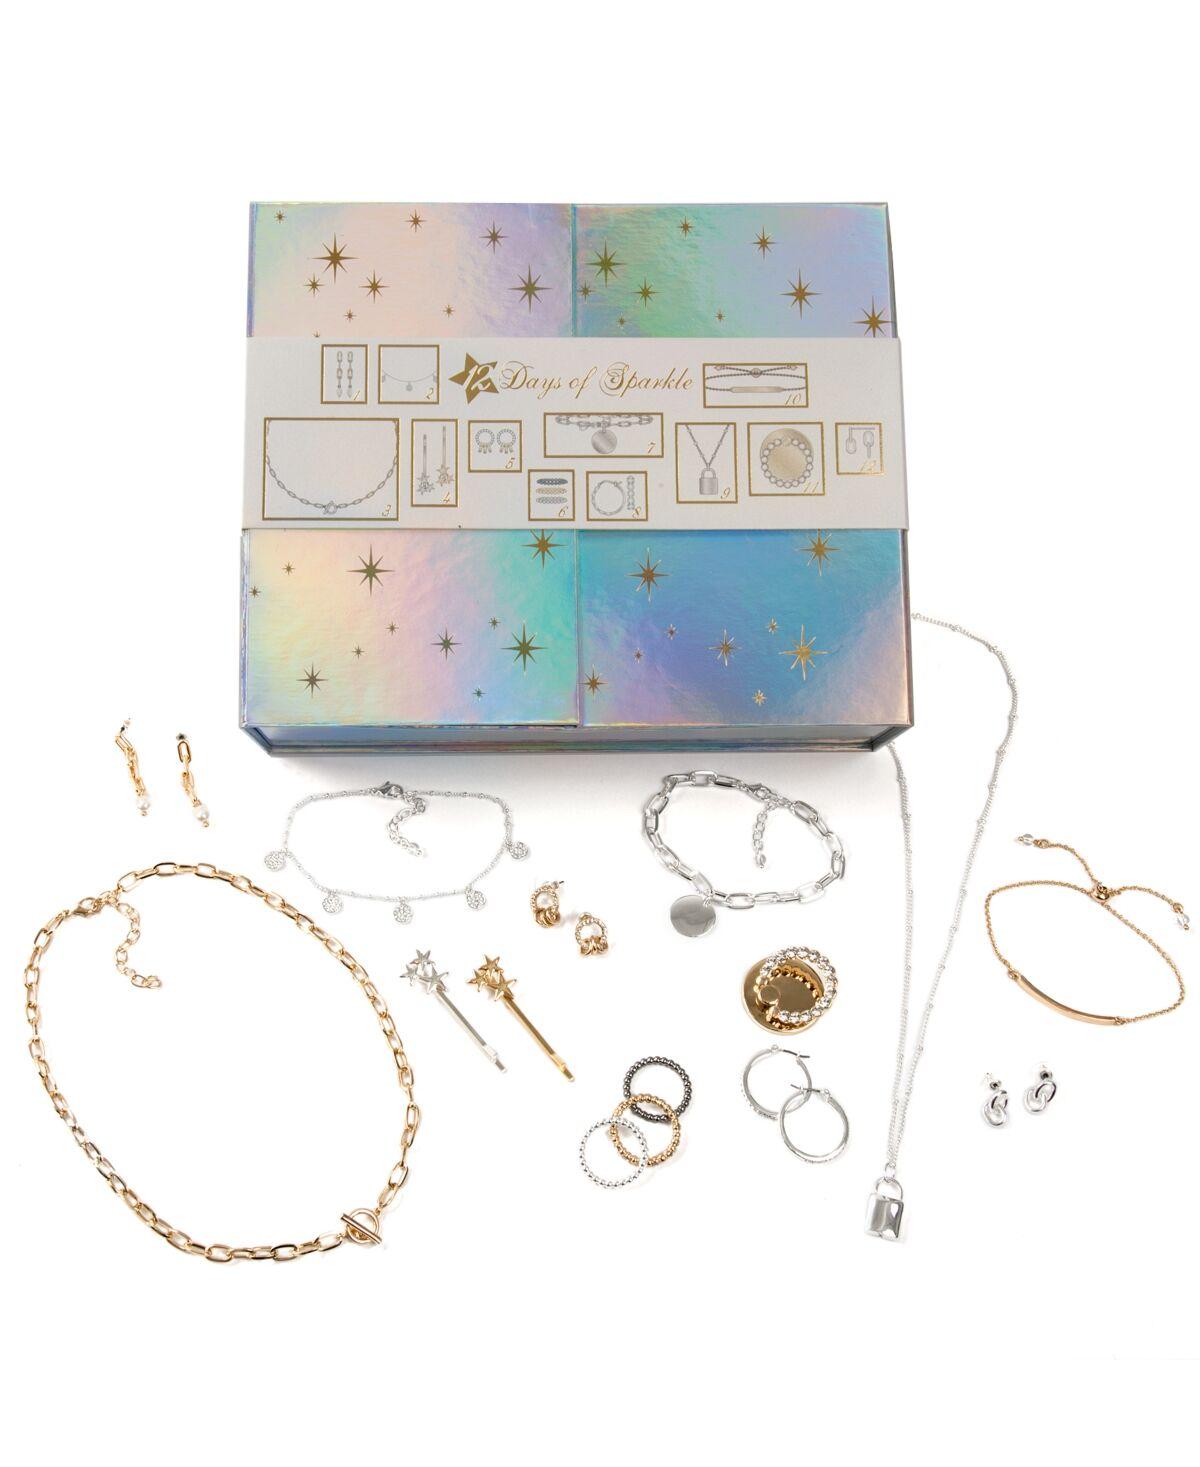 Jewelry Gift Set 12 Days of Sparkle Hologram Calendar